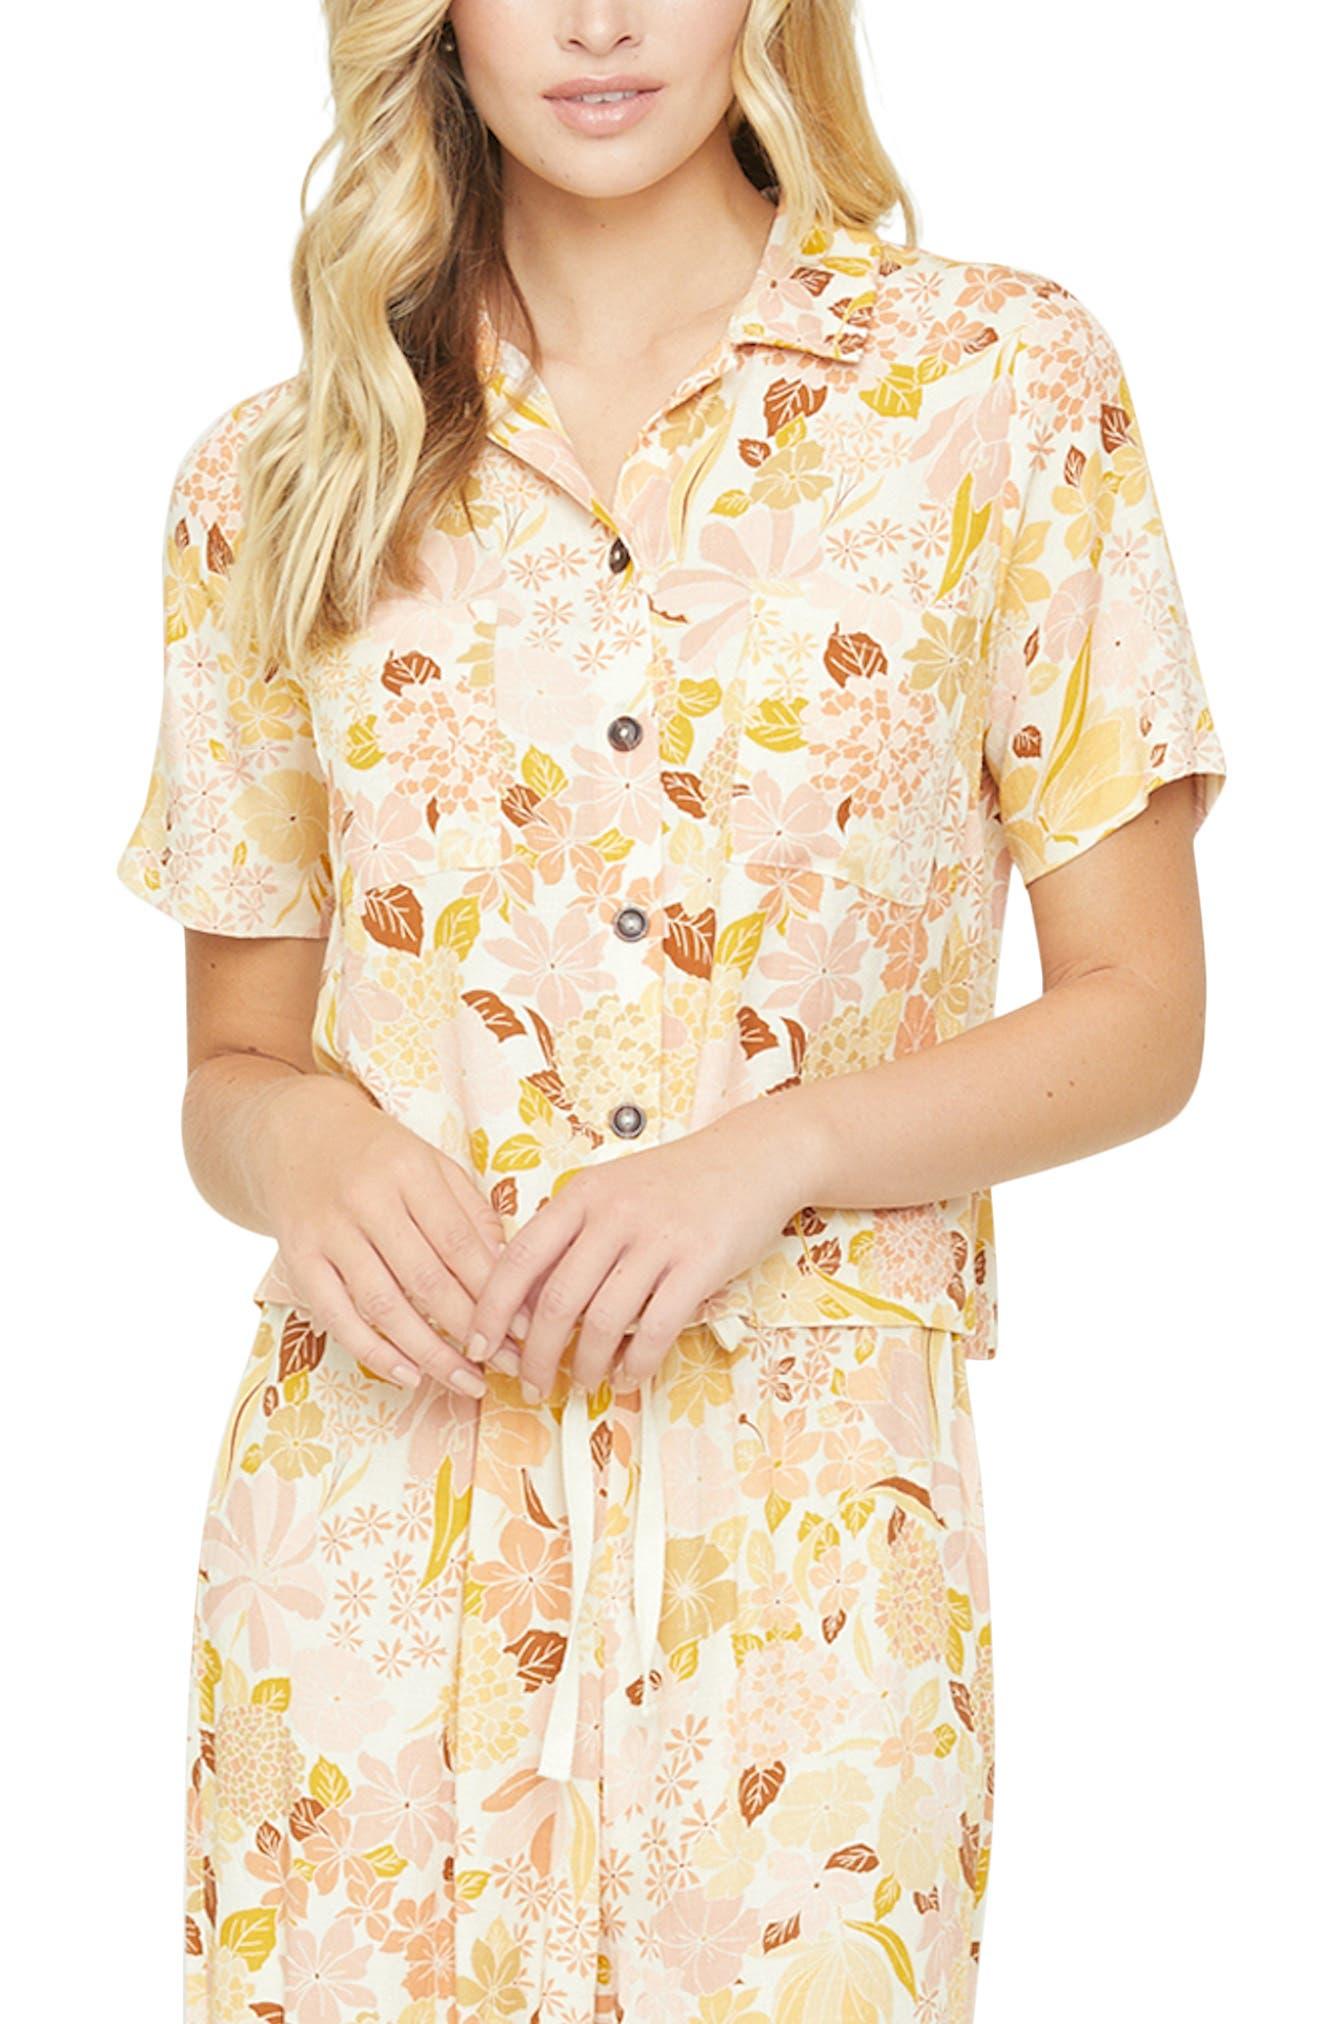 Women's Lost + Wander Sorrento Floral Shirt